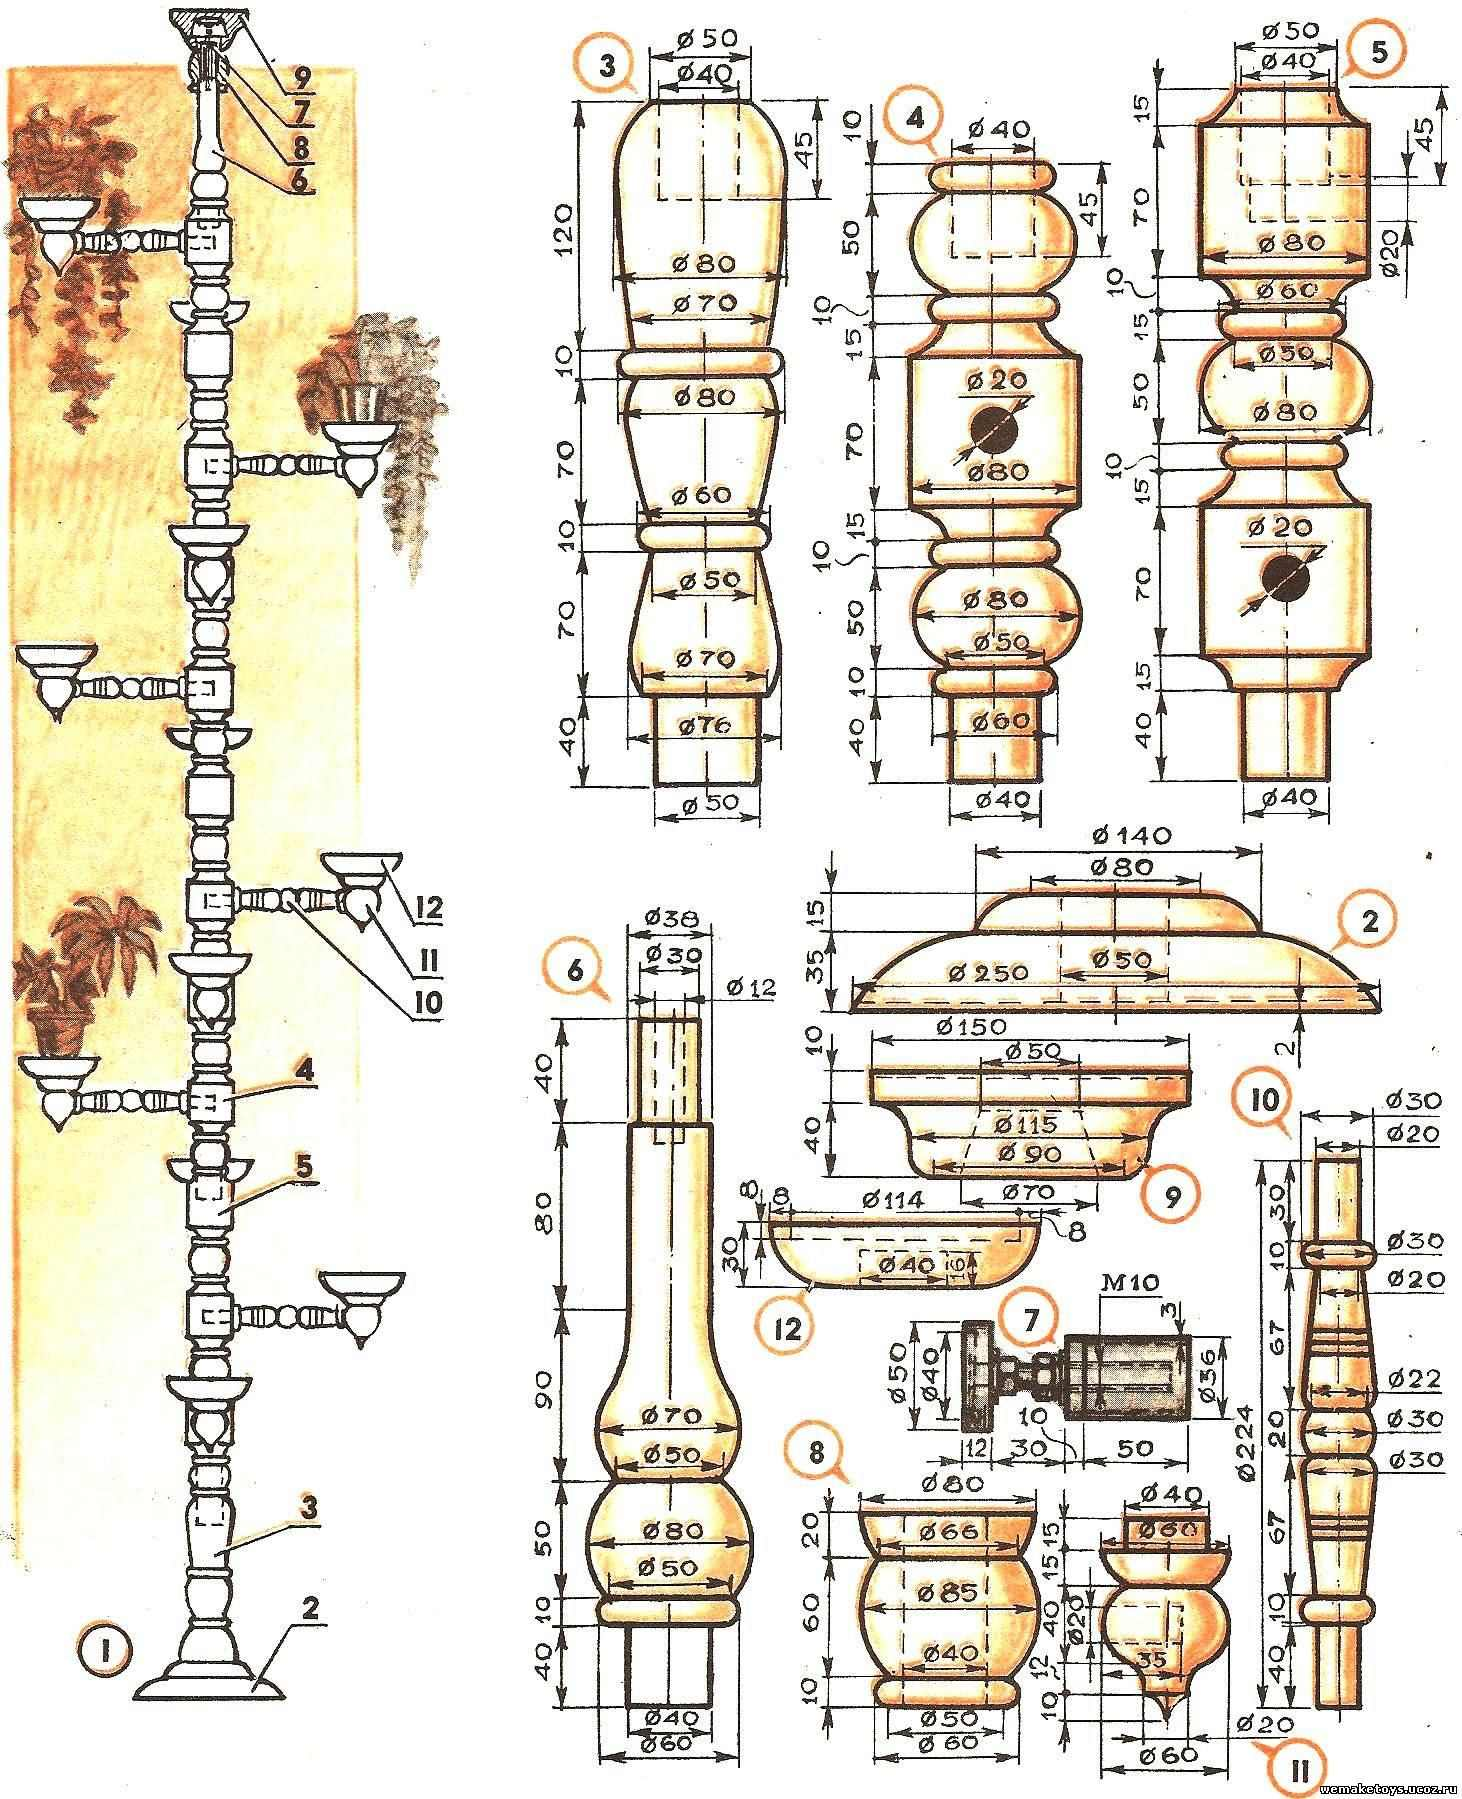 Маркировка биполярных SMD - транзисторов | SMD ...